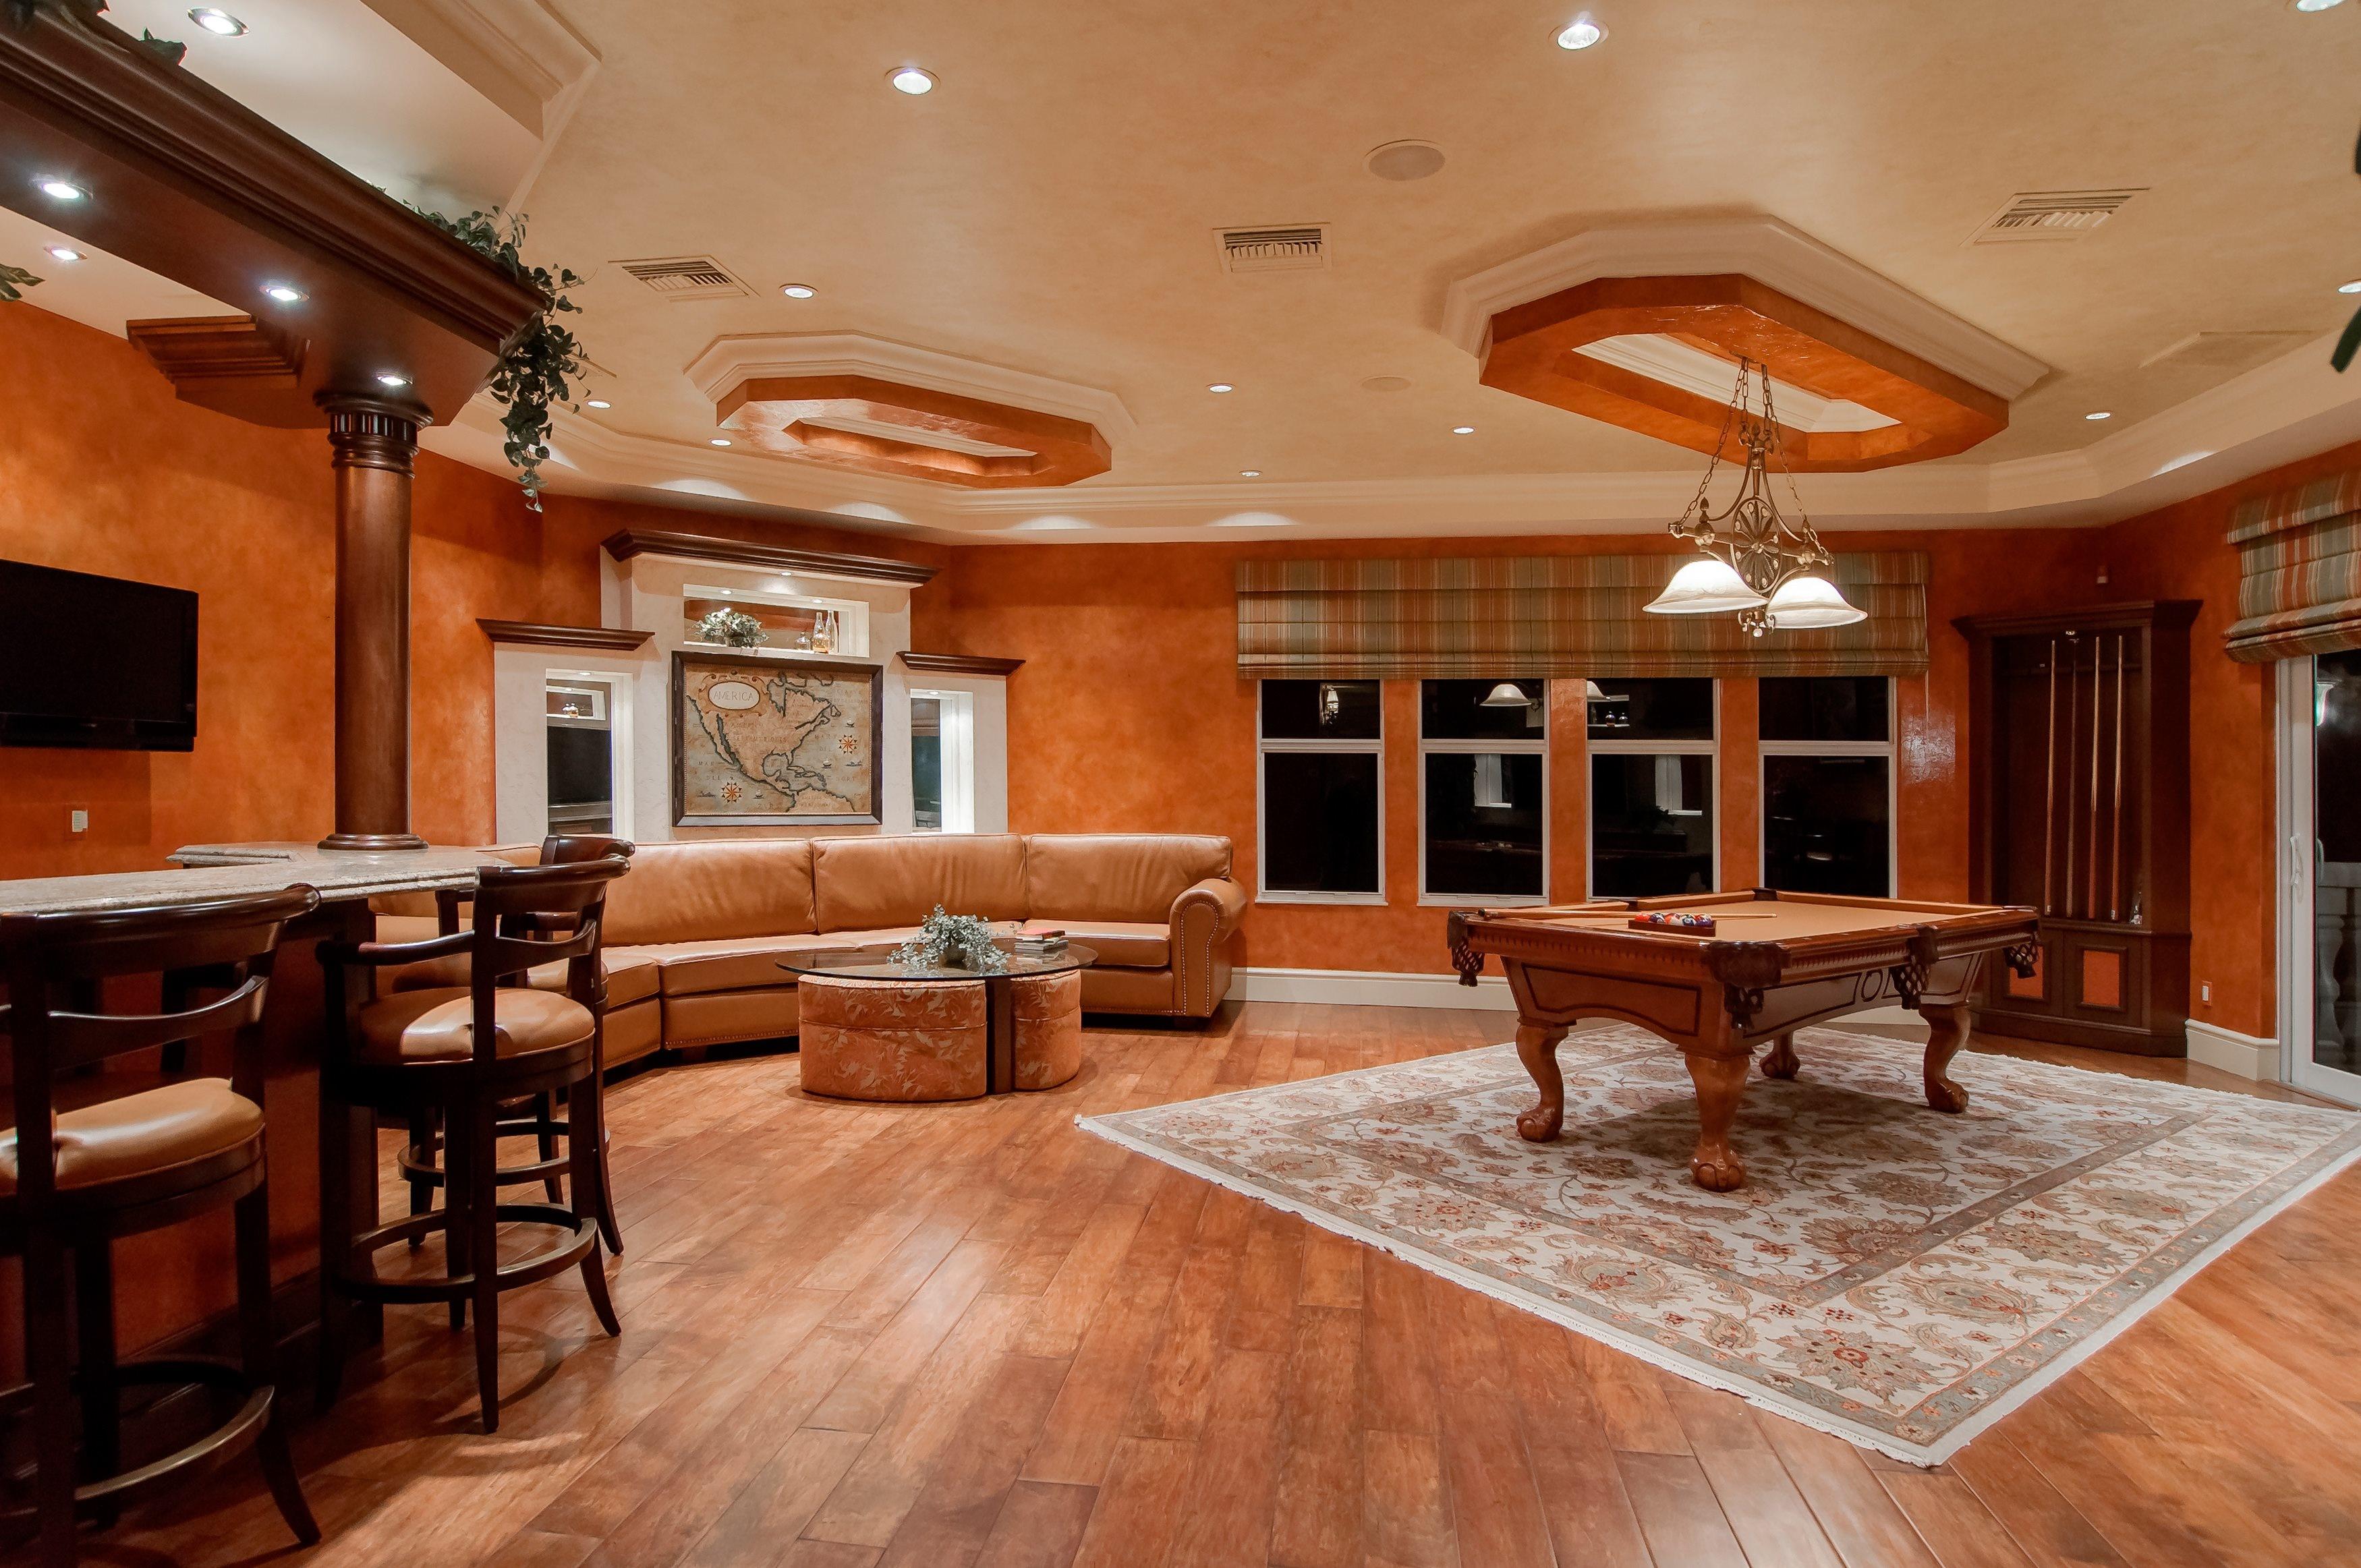 Fotos gratis : palacio, piso, interior, casa, techo, cocina ...